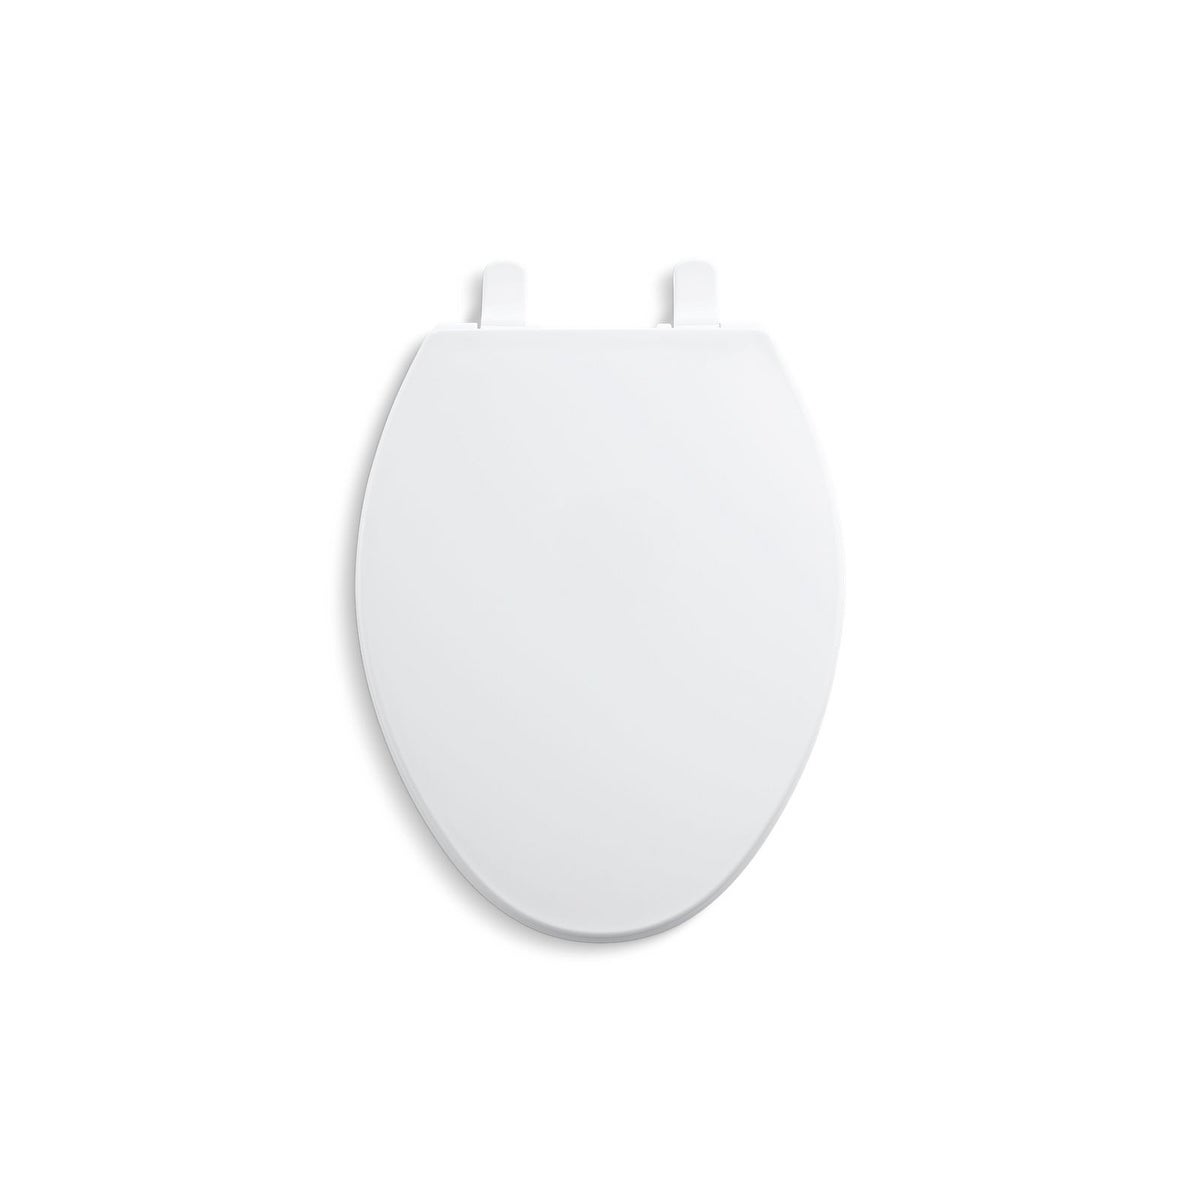 Remarkable Kohler Brevia Plastic Elongated Toilet Seat K 4774 0 White Beatyapartments Chair Design Images Beatyapartmentscom